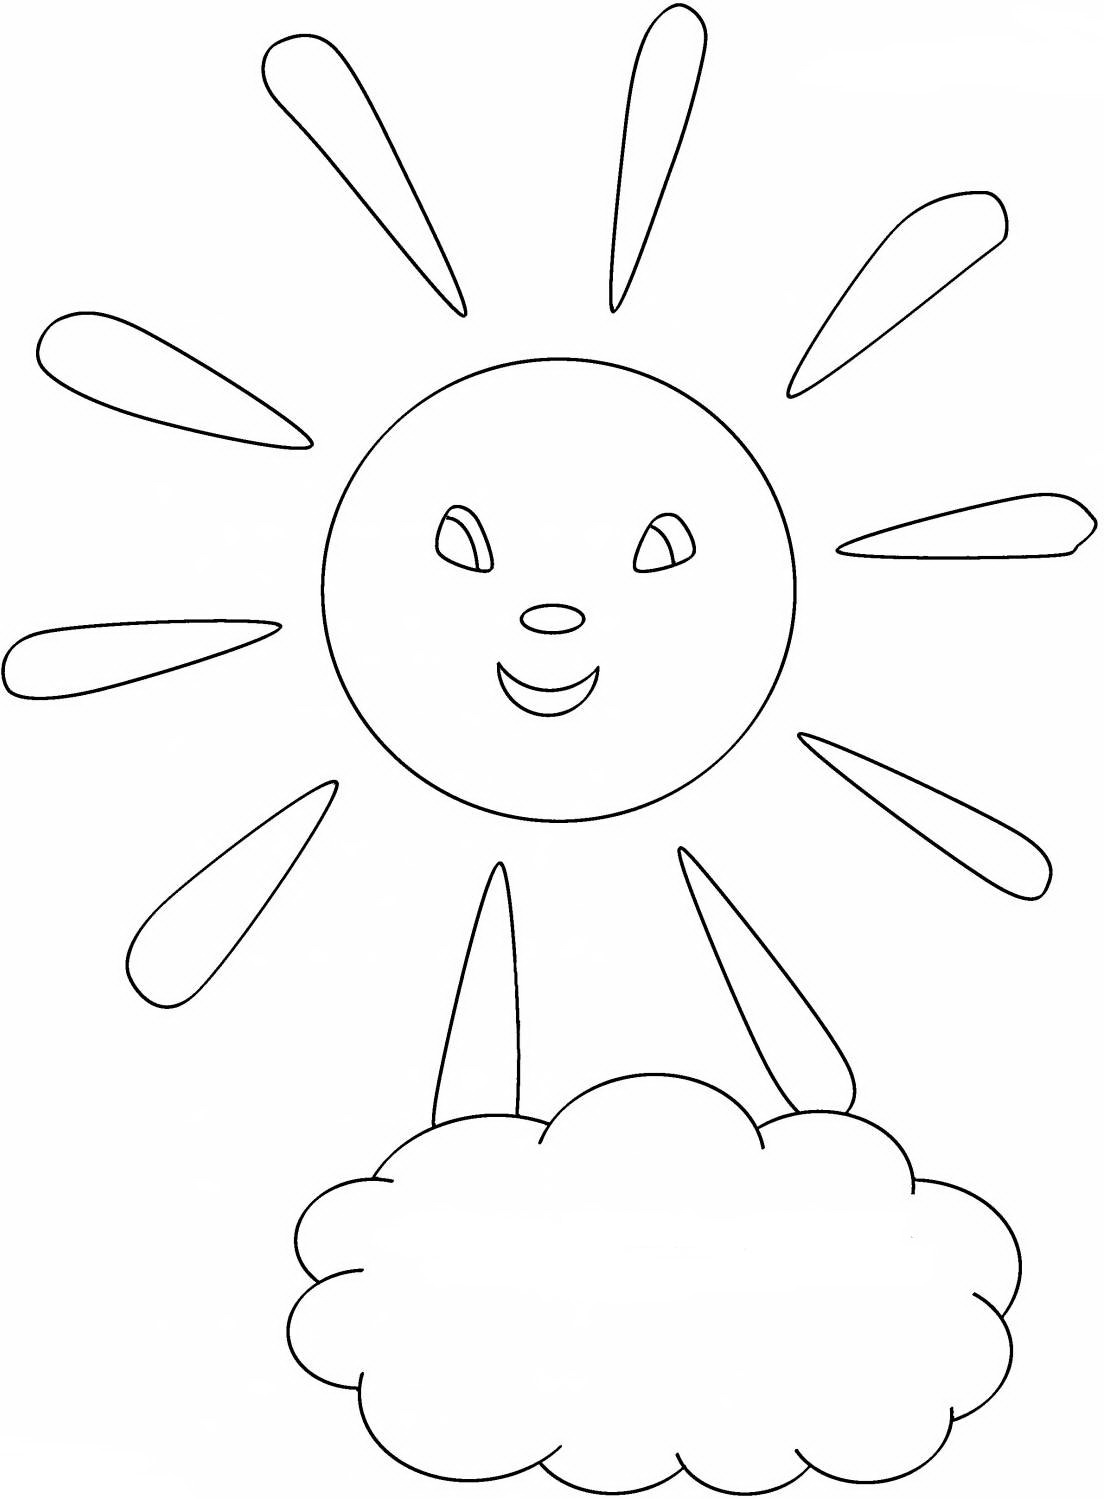 Раскраска солнце - 9b5